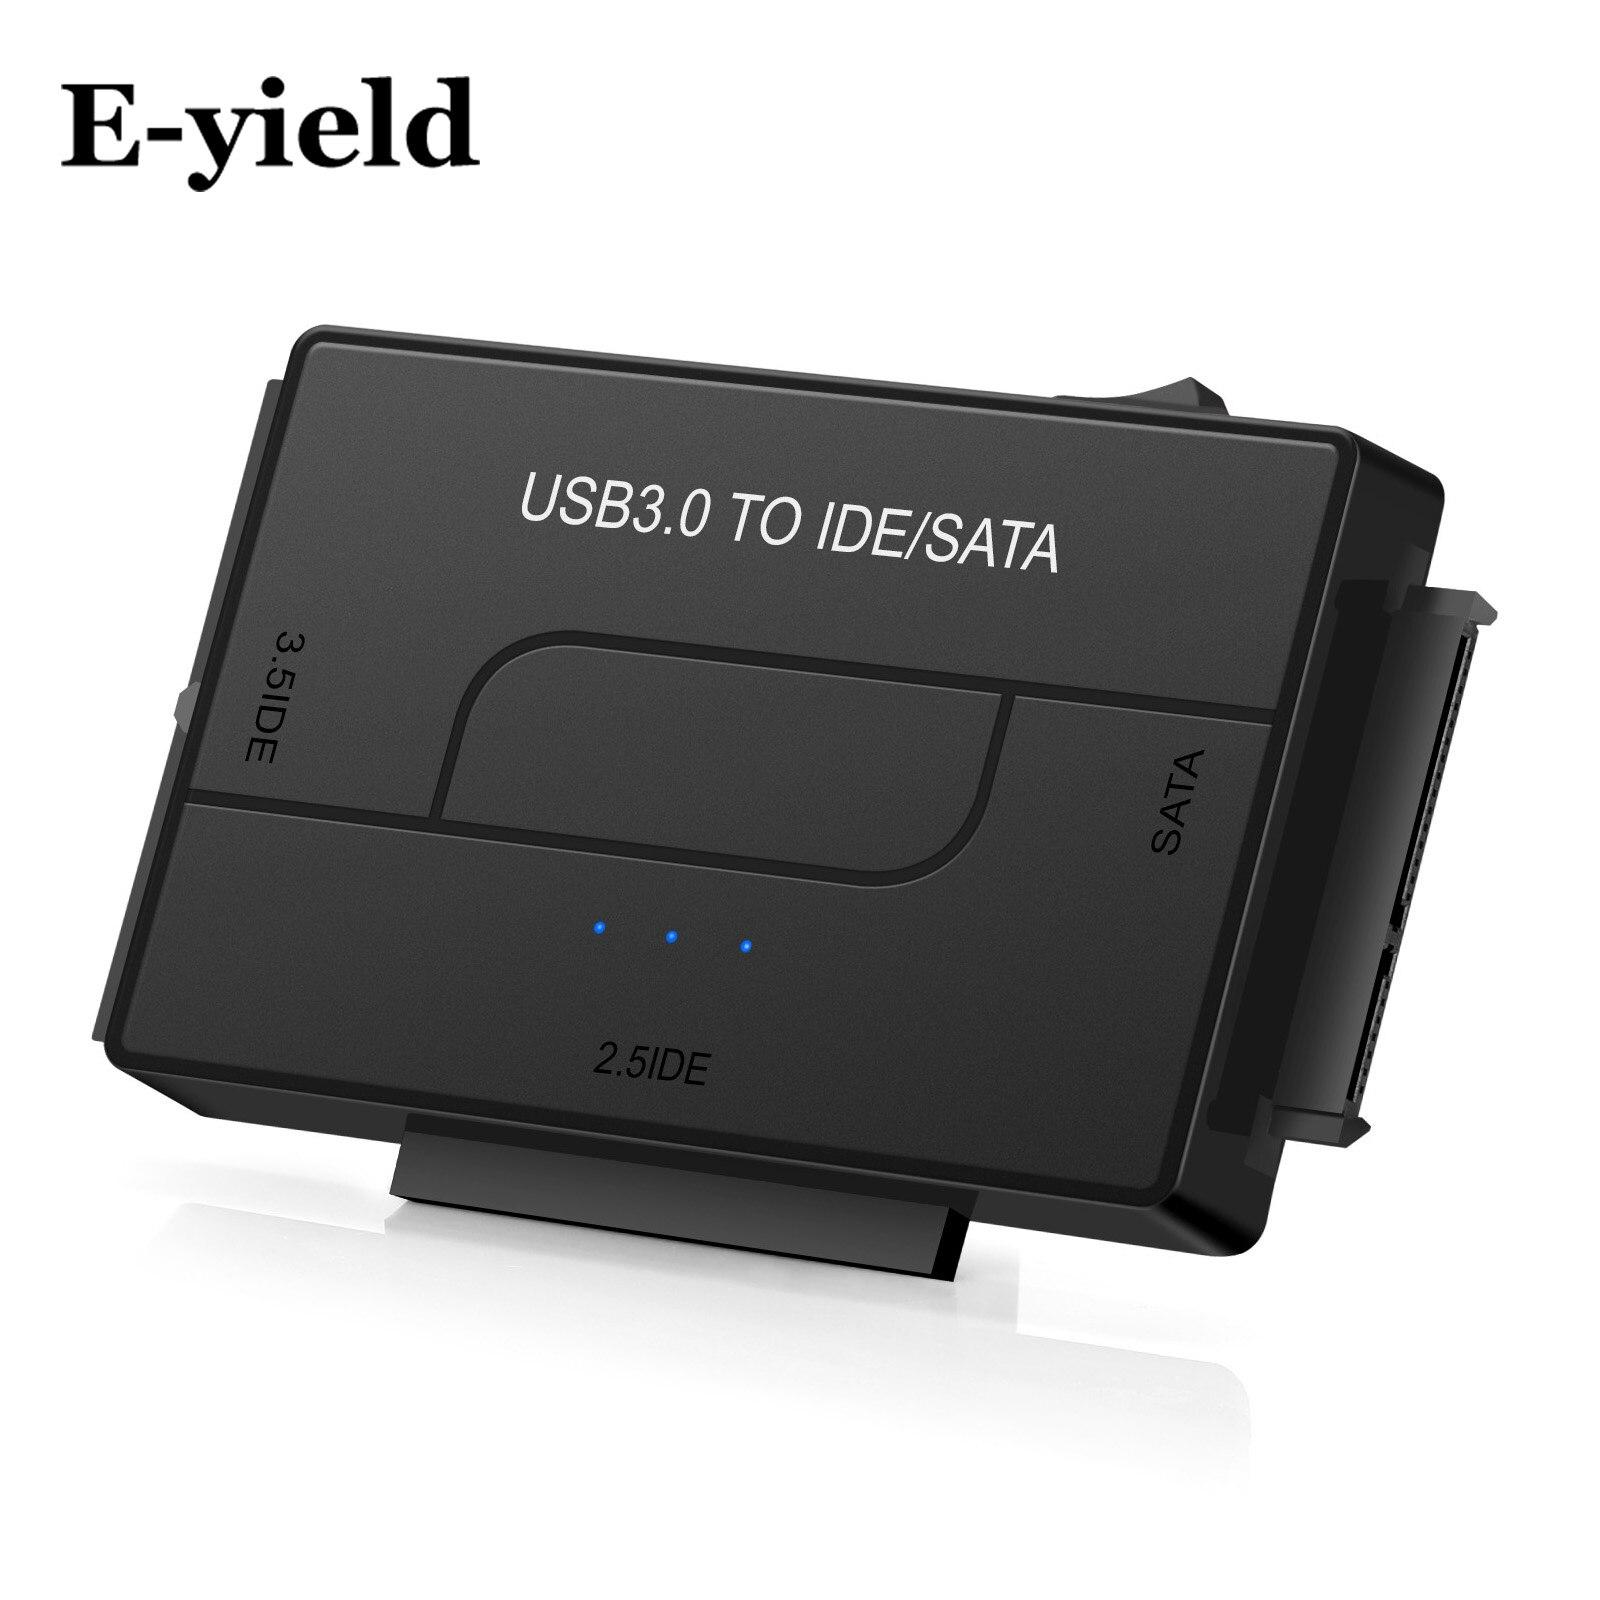 SATA كومبو USB IDE SATA محول قرص صلب SATA إلى USB3.0 محول نقل البيانات ل 2.5/3.5/5.25 محرك الأقراص الضوئية HDD SSD